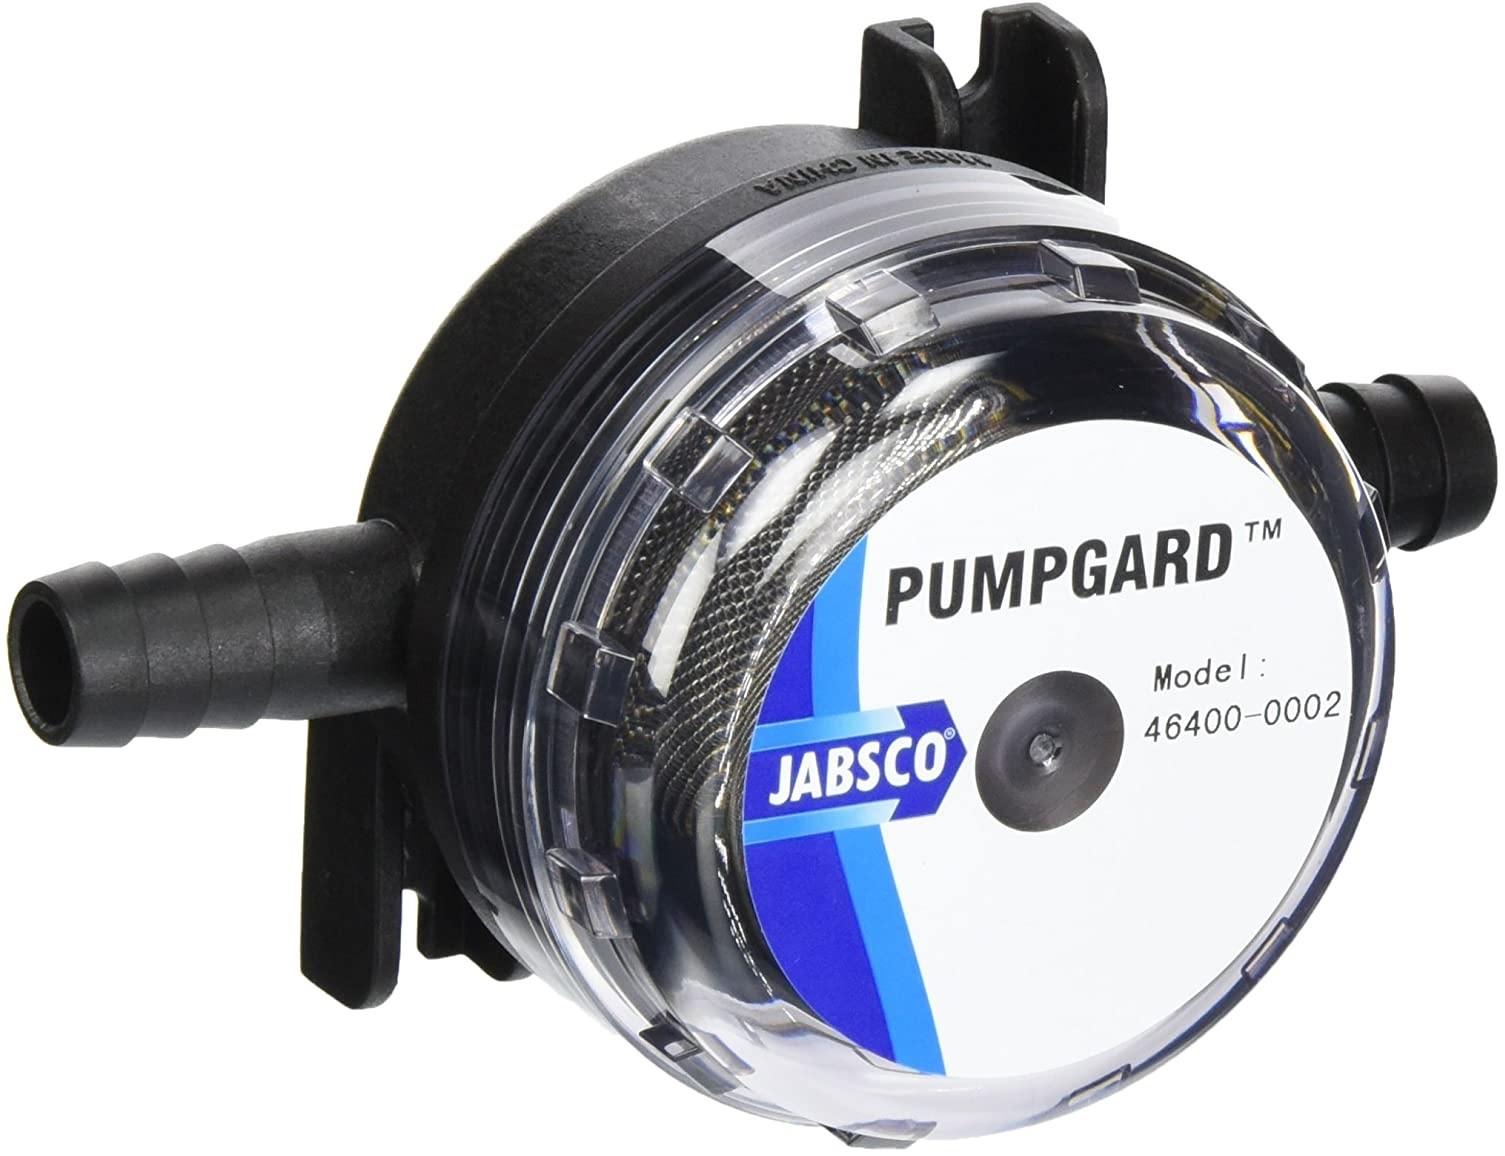 Filtro de Água Jabsco Pumpgard Modelo 46400-0002 com conexão 1/2